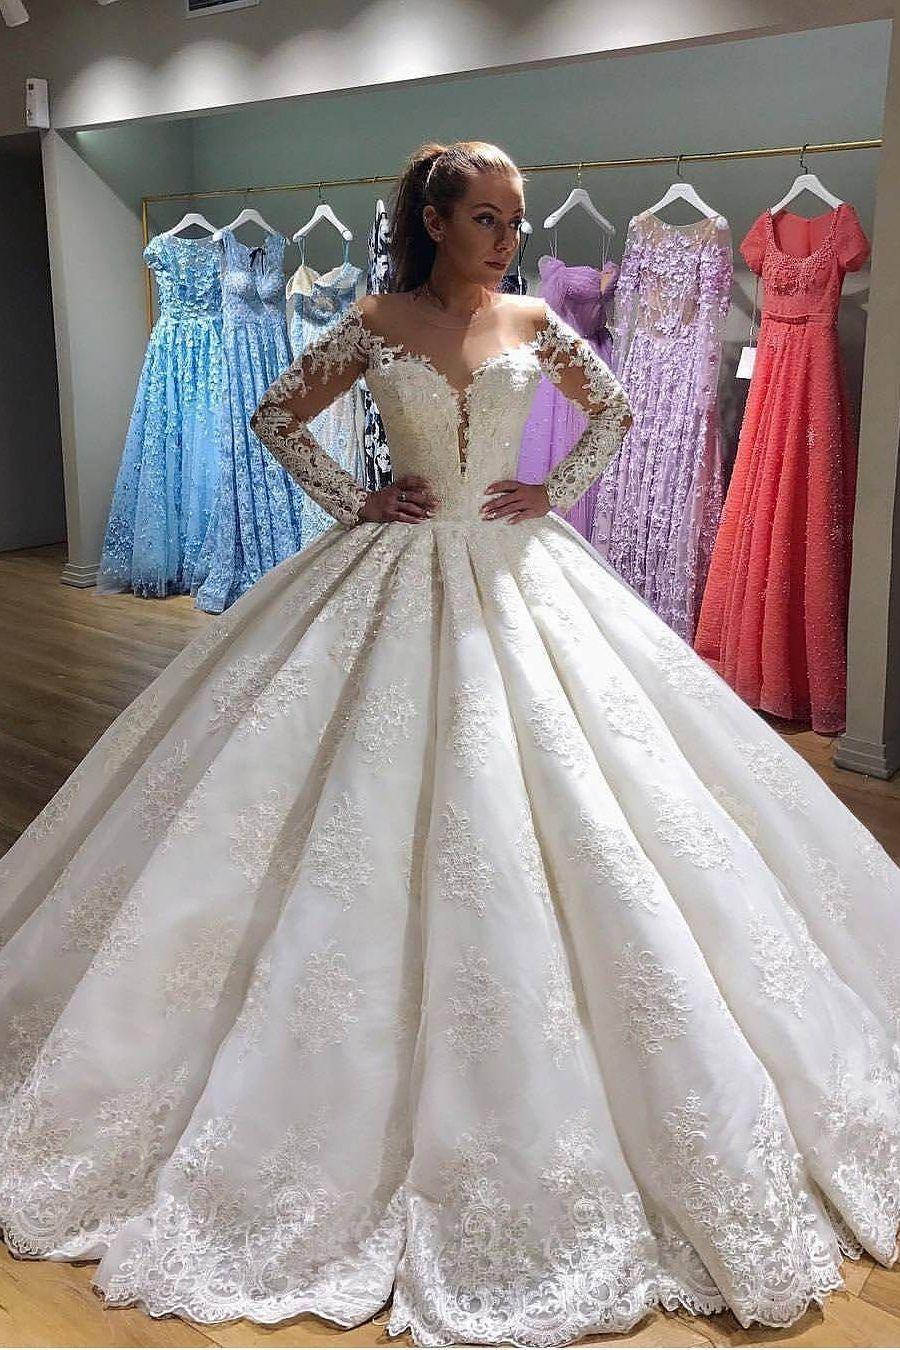 2019 Scoop Long Sleeves Ballkleid Brautkleider Tüll mit Applikation Sweep Zug #tulleballgown